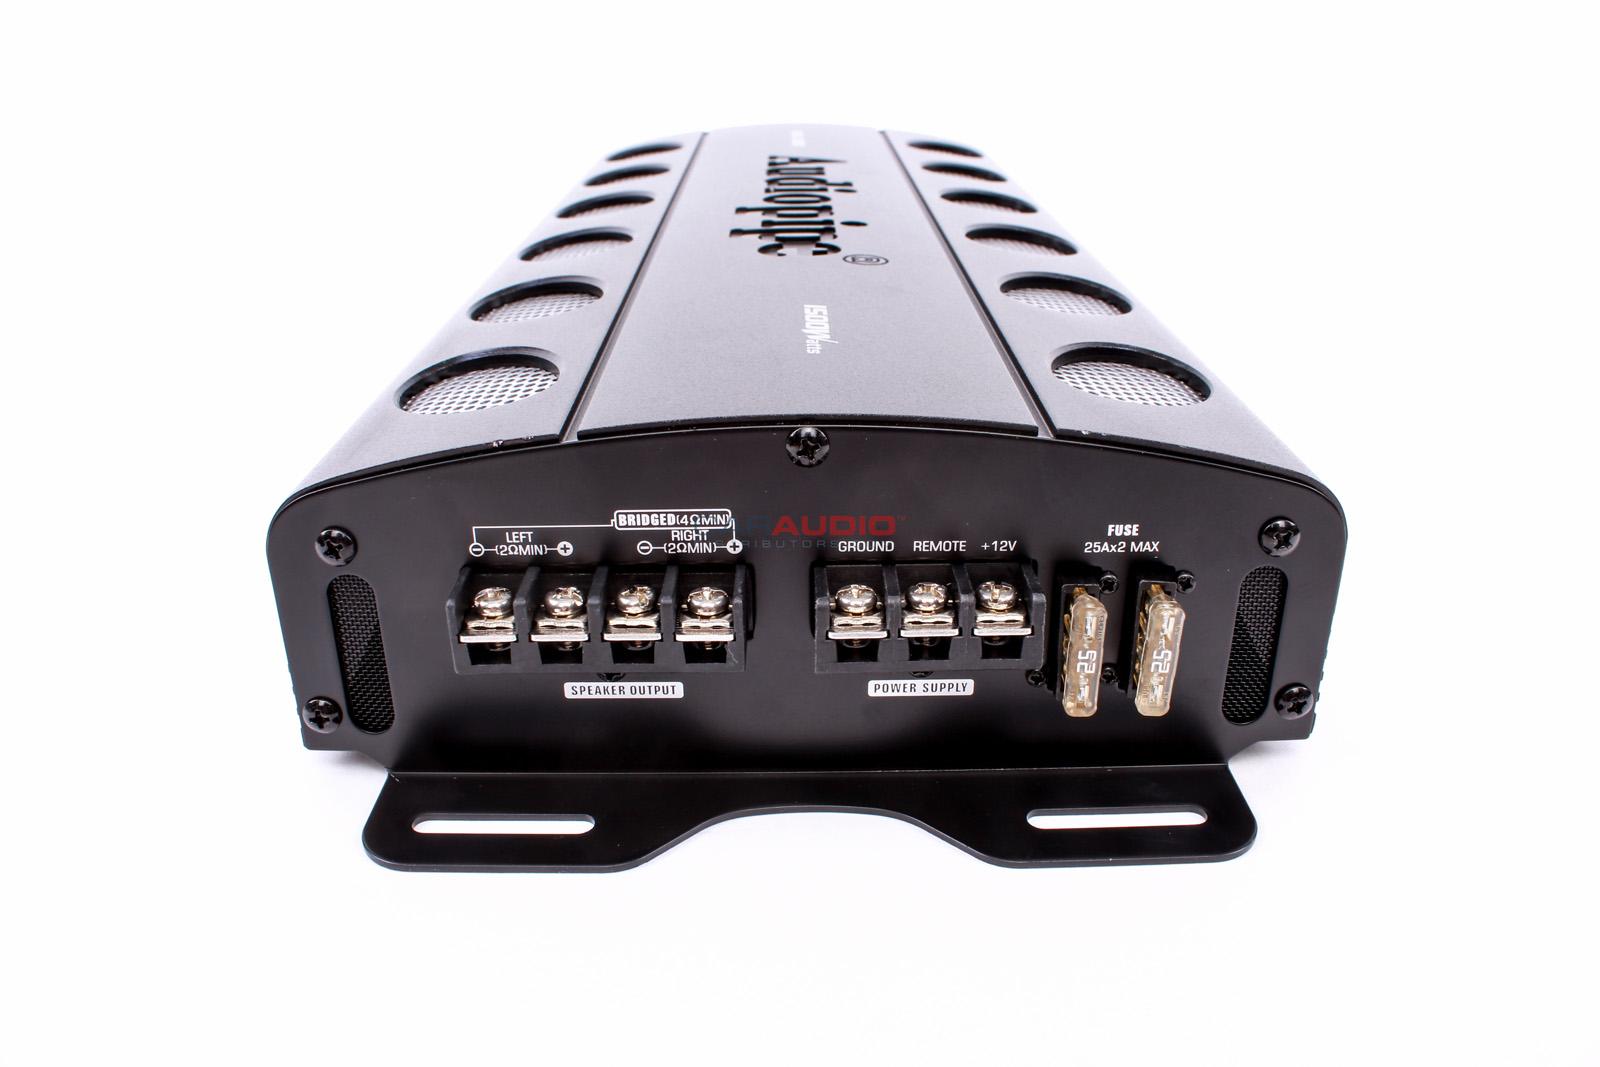 new audiopipe apcl 3002 1500 watt 2 channel car amplifier car audio car amp 2ch ebay. Black Bedroom Furniture Sets. Home Design Ideas